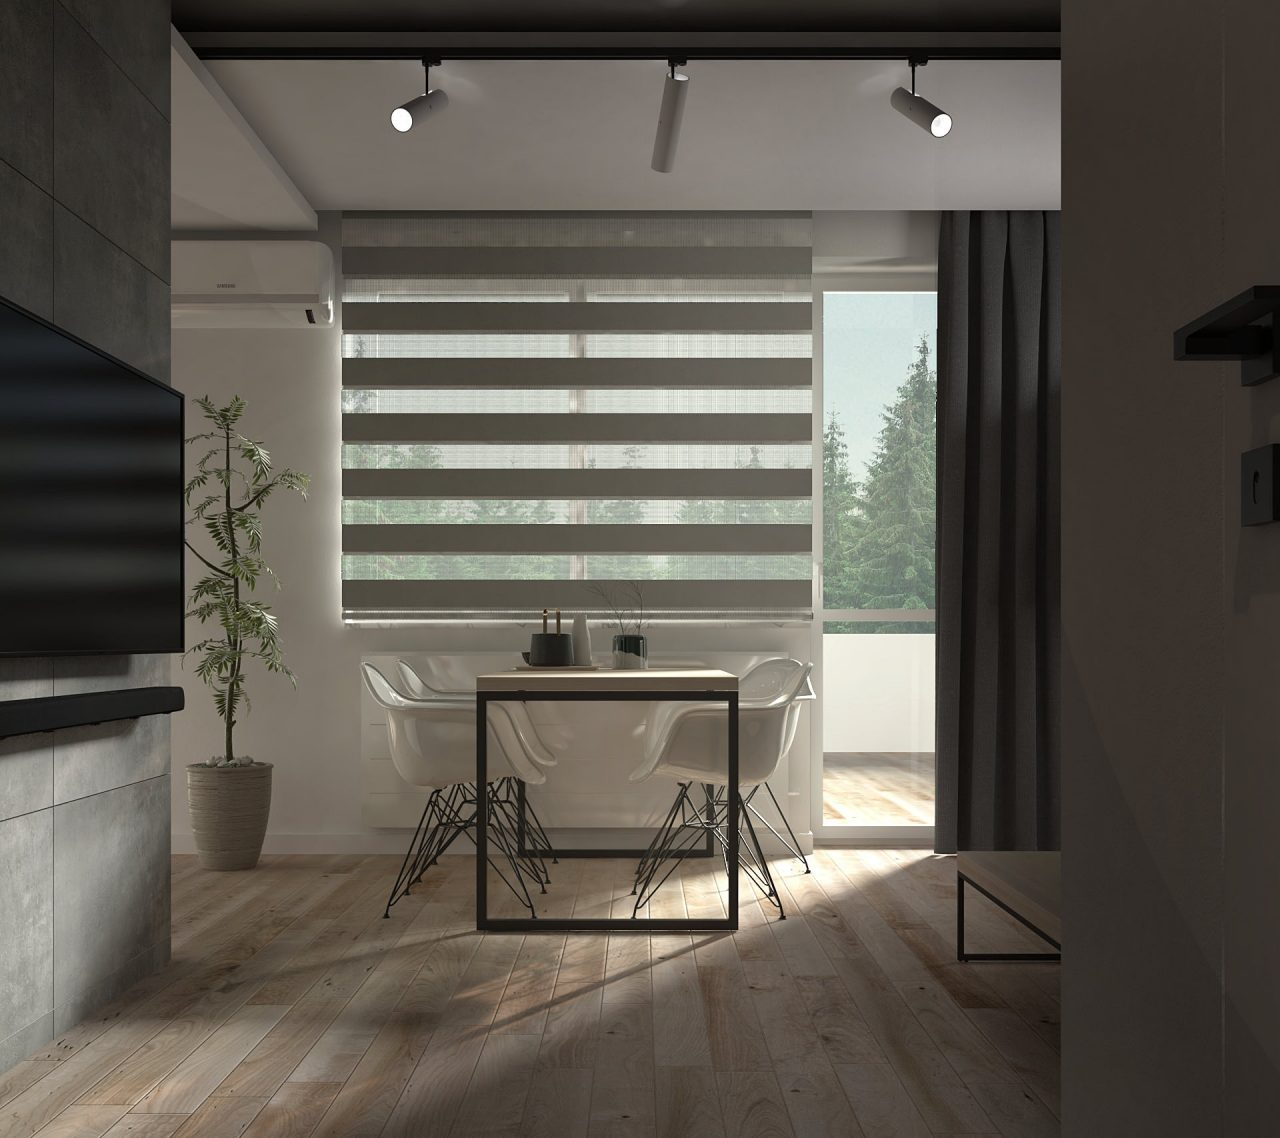 92-minProjekt mieszkania M3